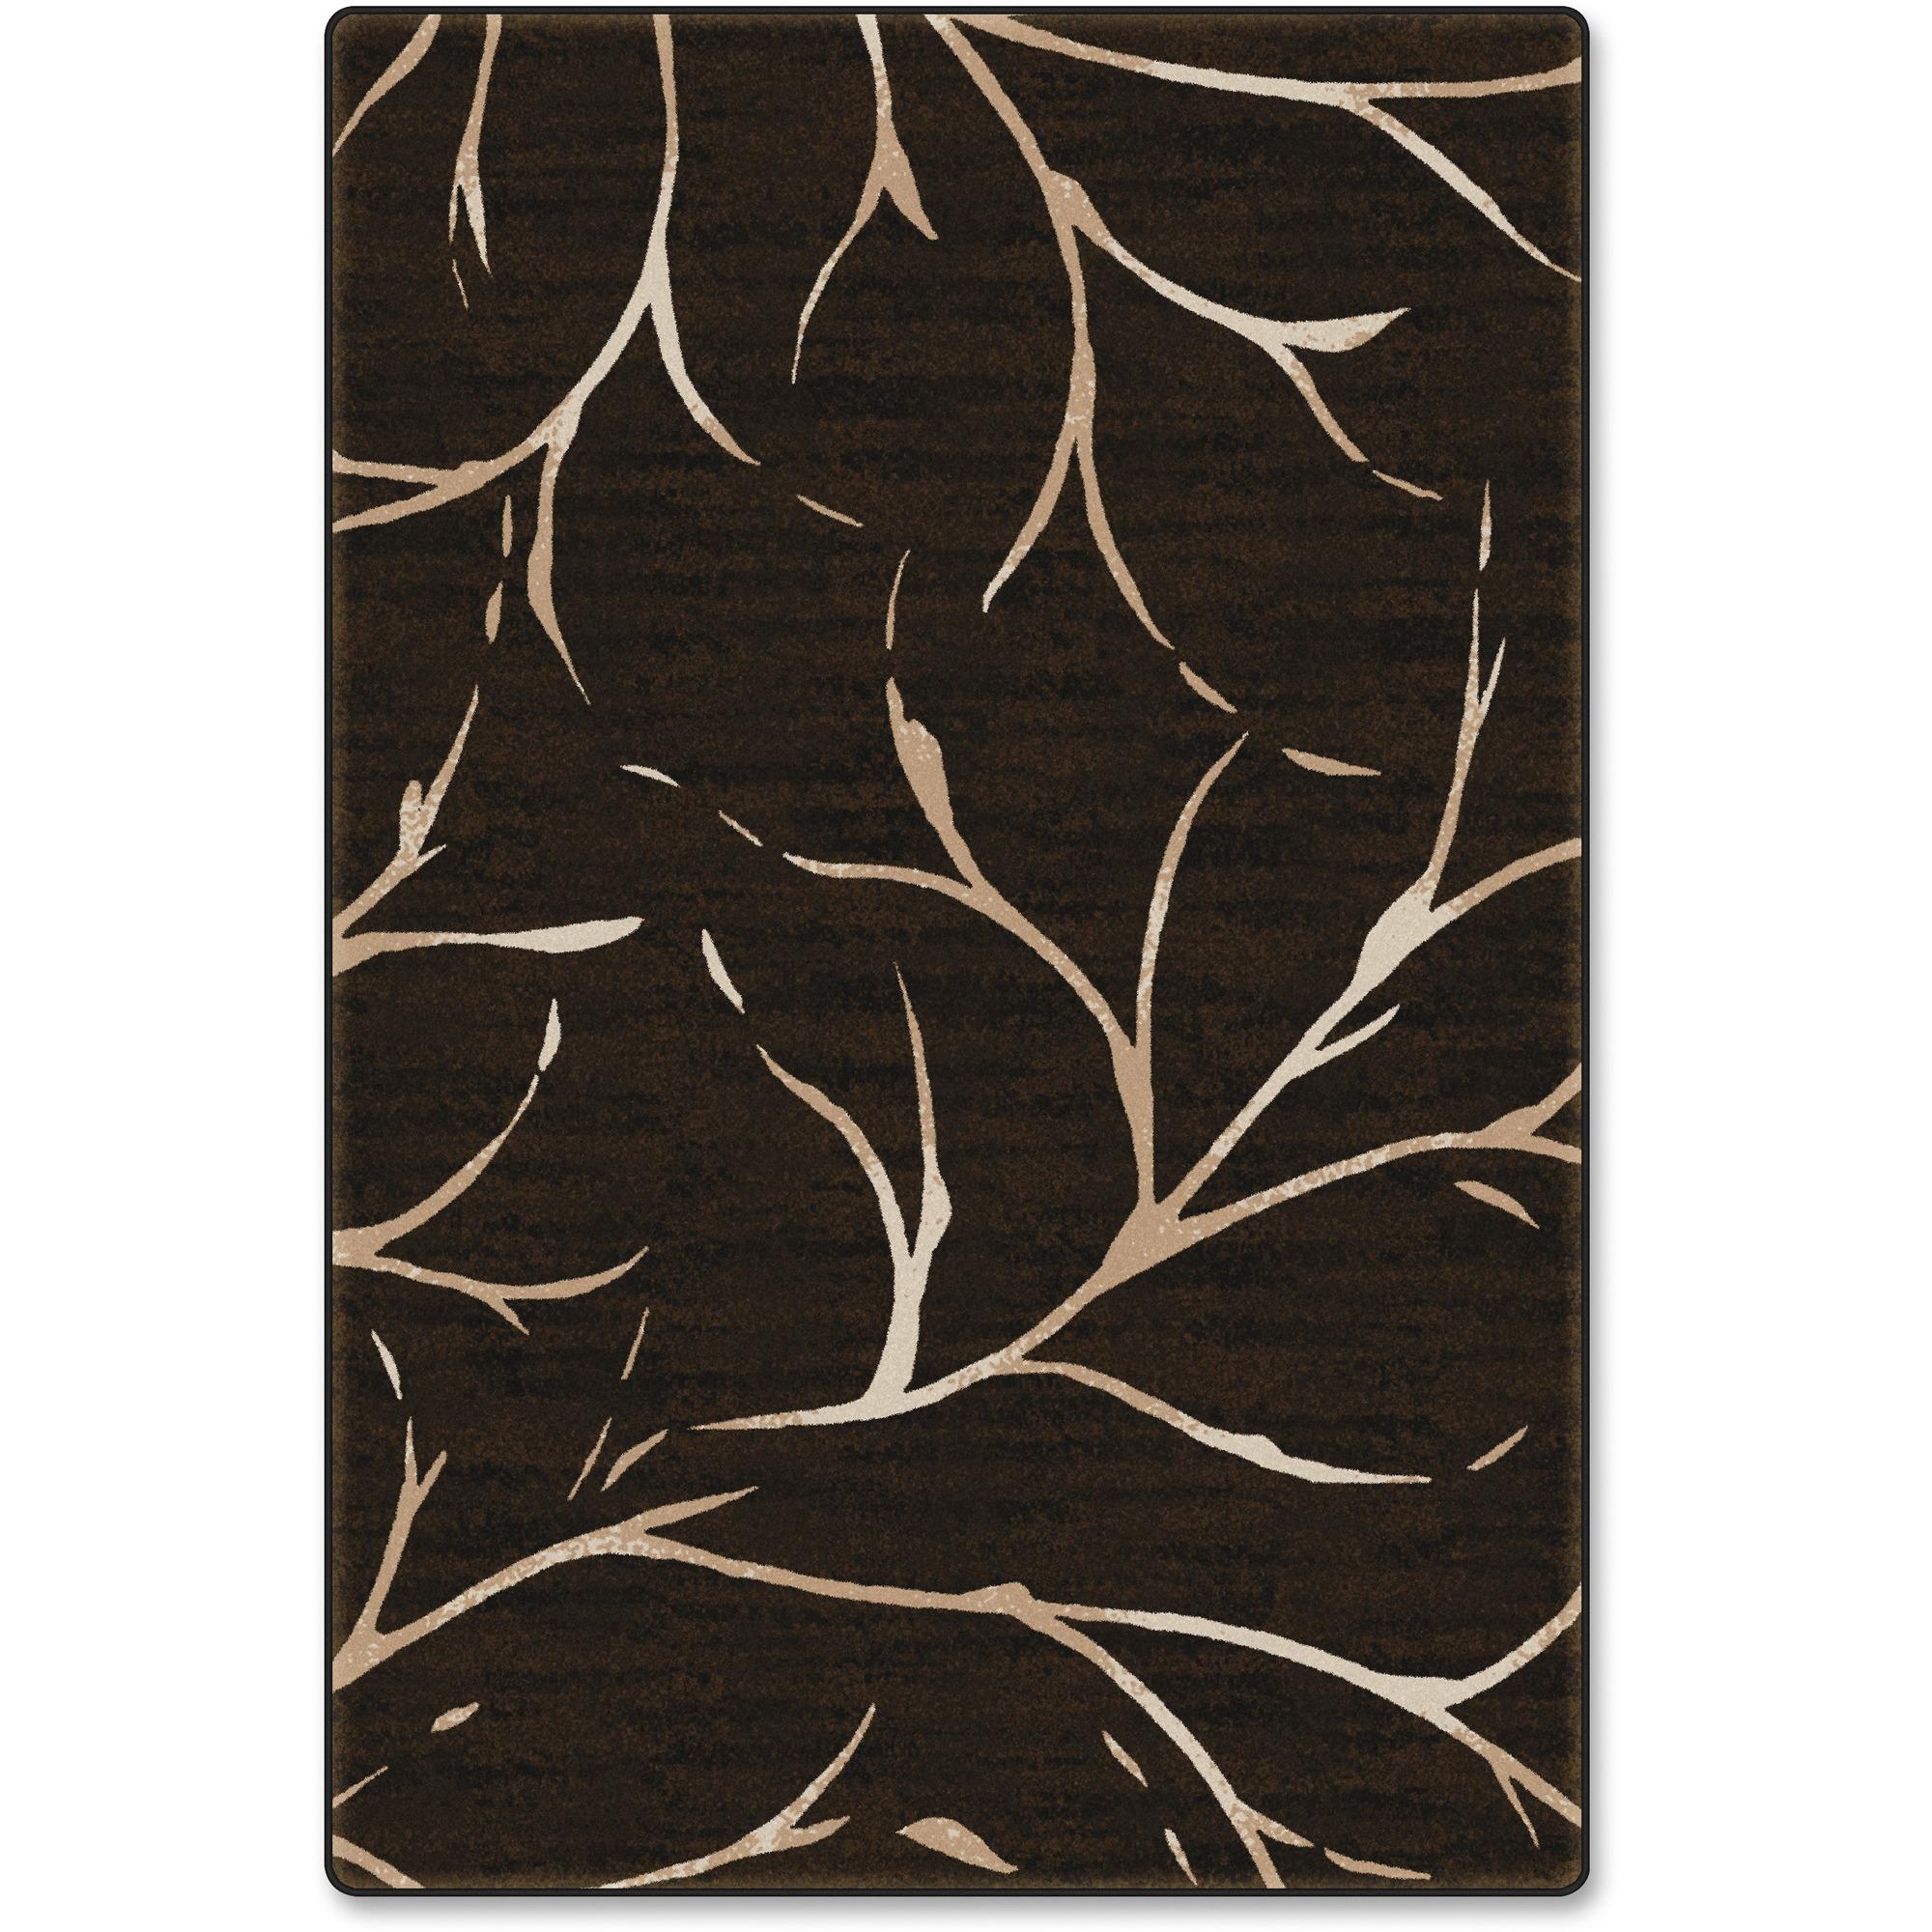 Flagship Carpets Dark Choc Moreland Design Rug